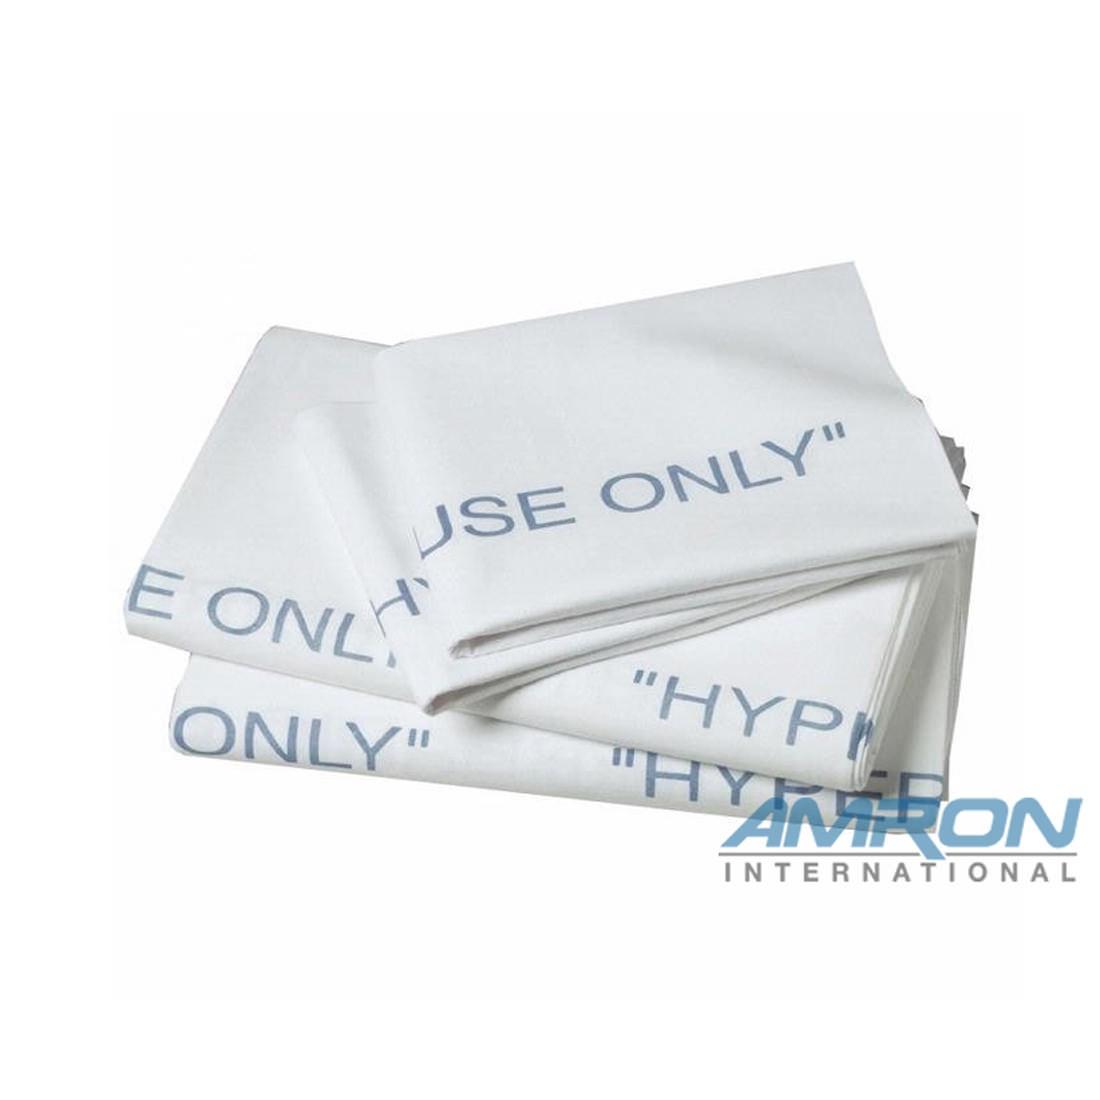 Medline Single Hyperbaric Pillow Case - 100% Cotton - 42 in. x 34 in. MDL-MDT219021-1